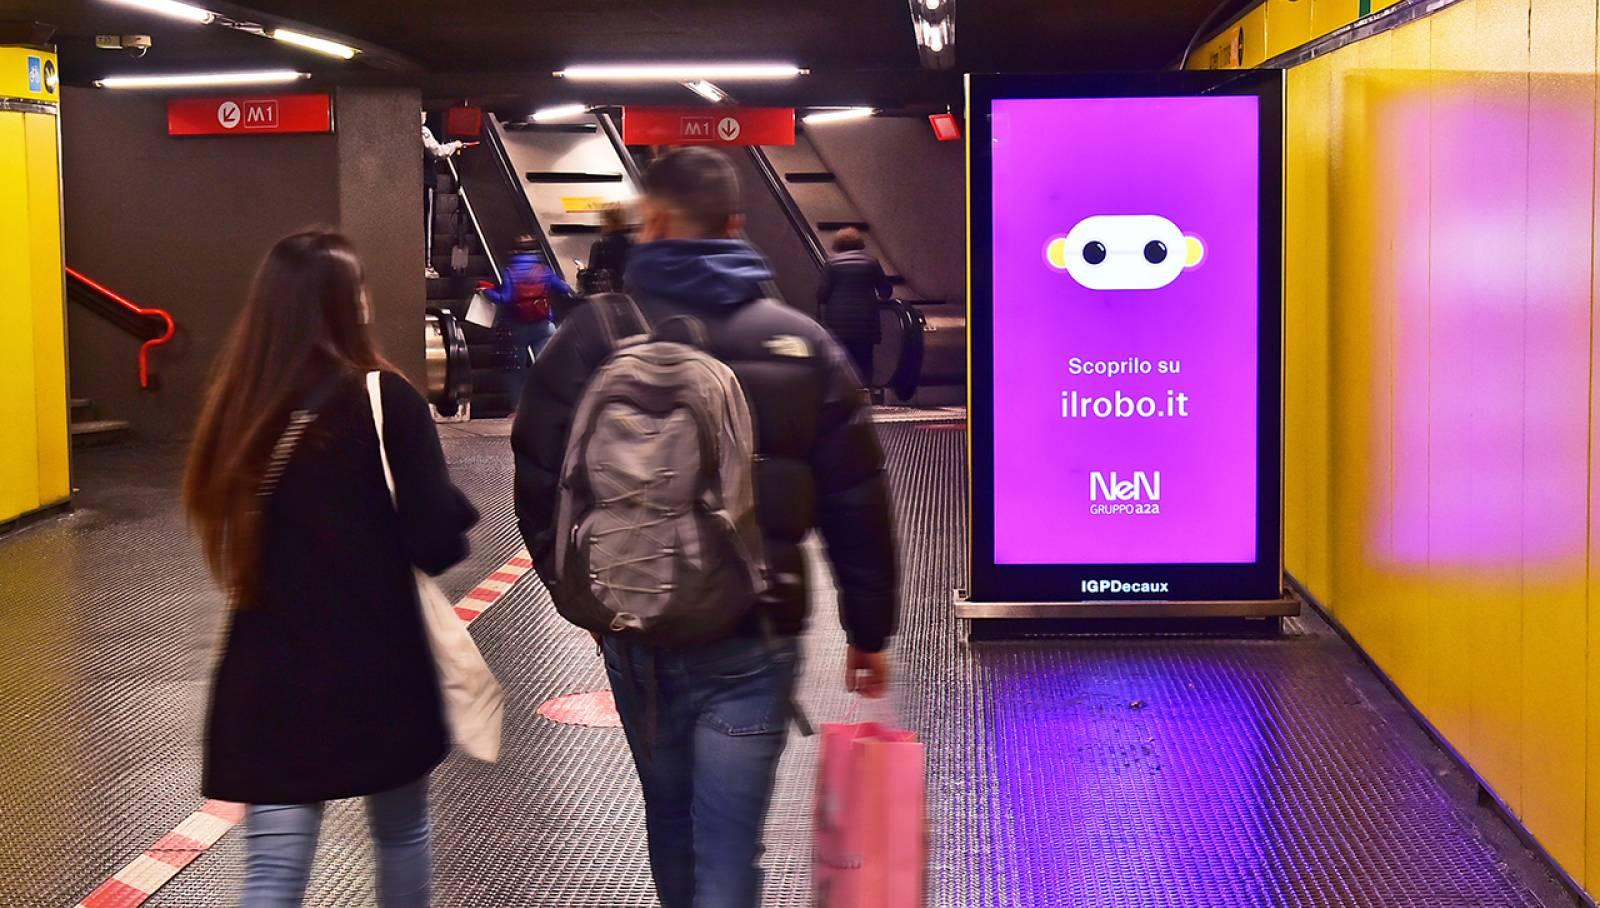 Pubblicità metro milanese IGPDecaux Network Vision per NeN